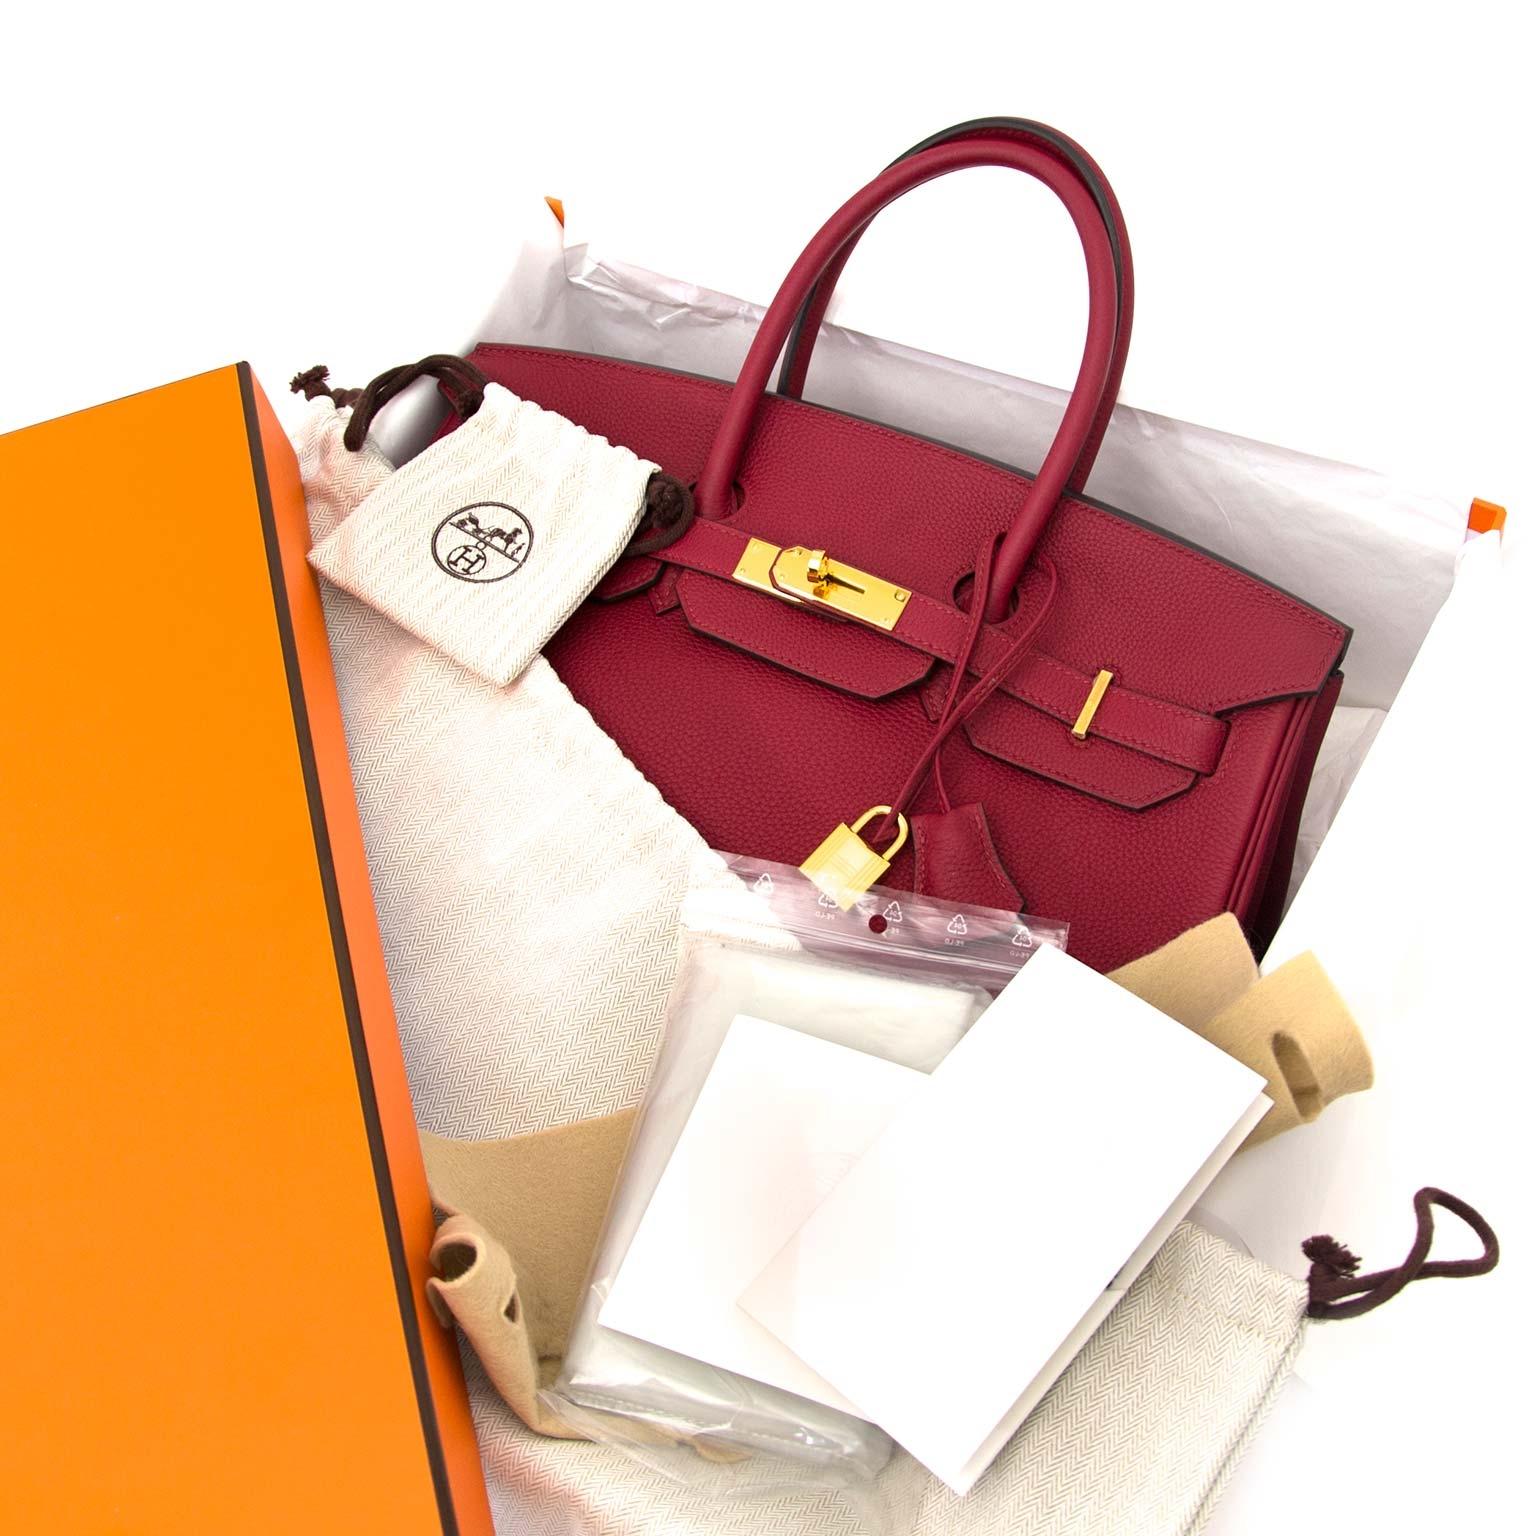 acheter en ligne chez labellov.com Hermès Birkin 35 Togo Rouge Grenat GHW